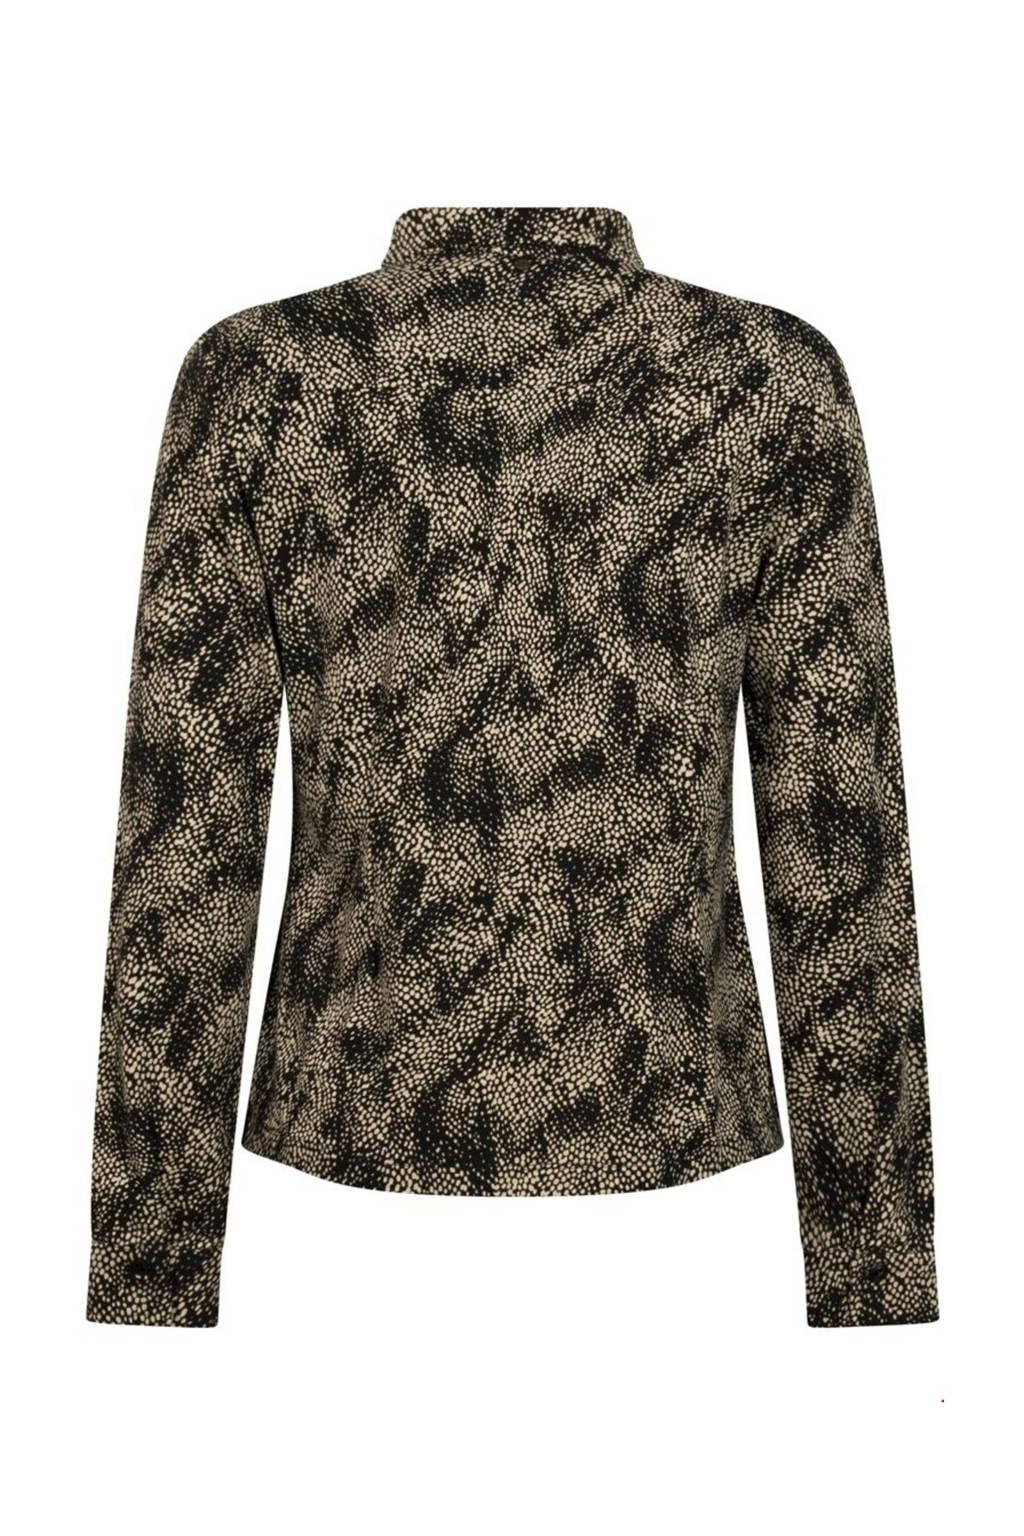 Tramontana blouse met all over print zwart/ecru, Zwart/ecru